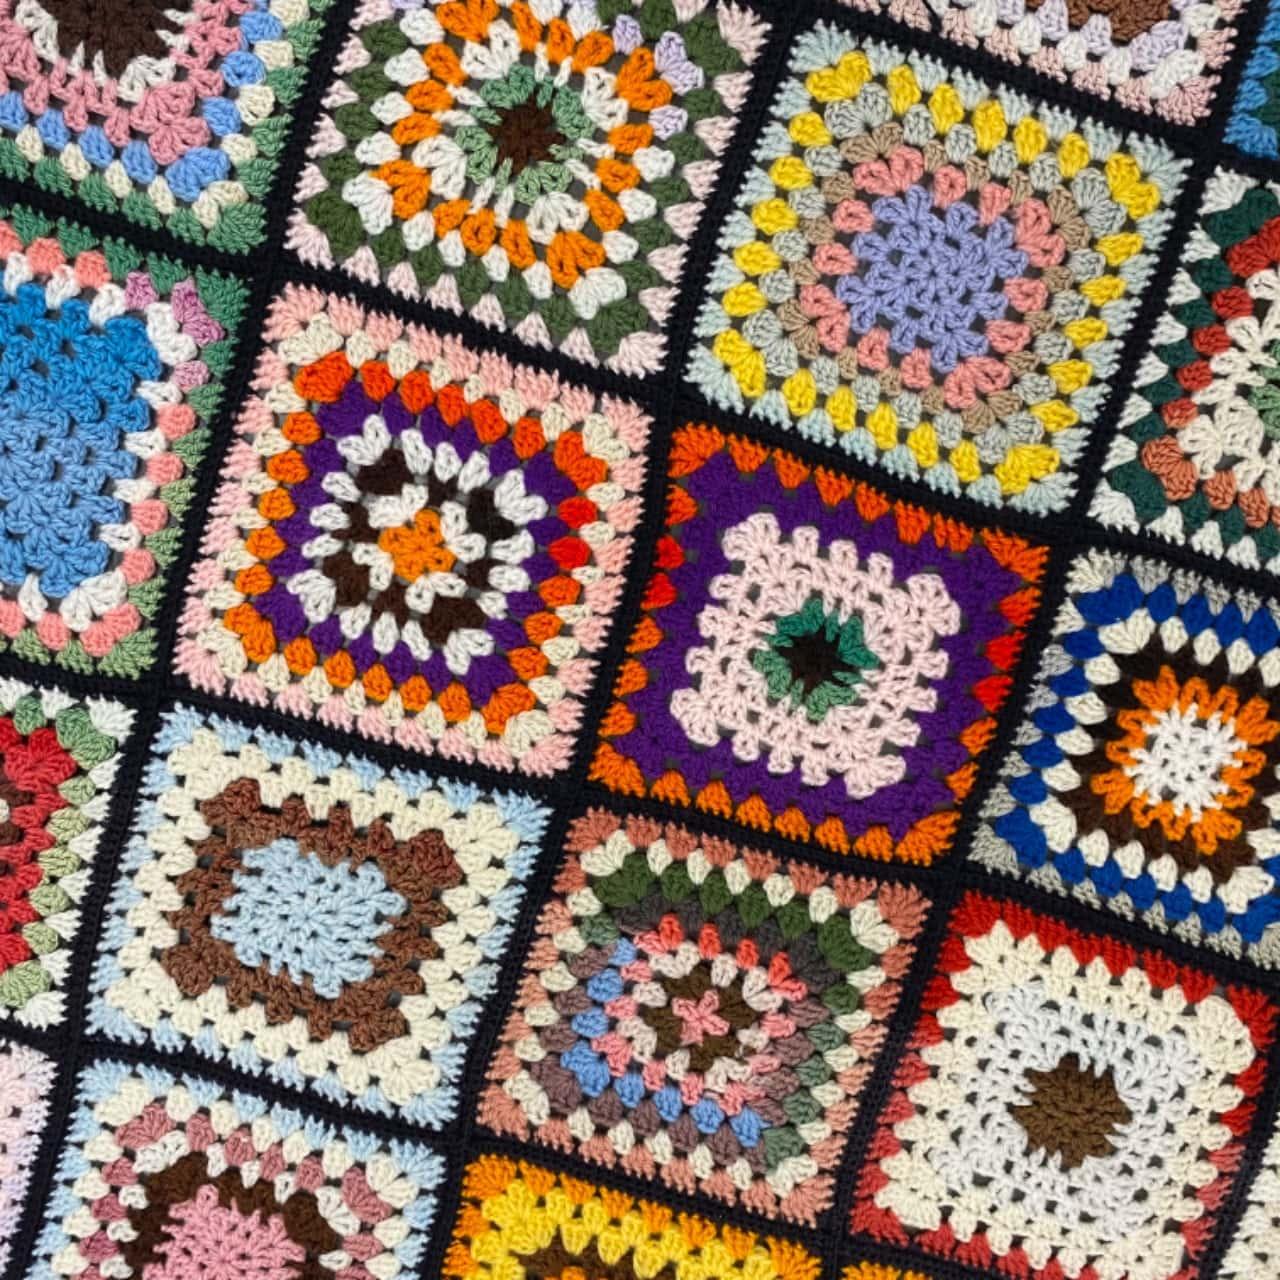 VINTAGE HAND CROTCHETED THROW BLANKET 98 cm x 136 cm multicolours